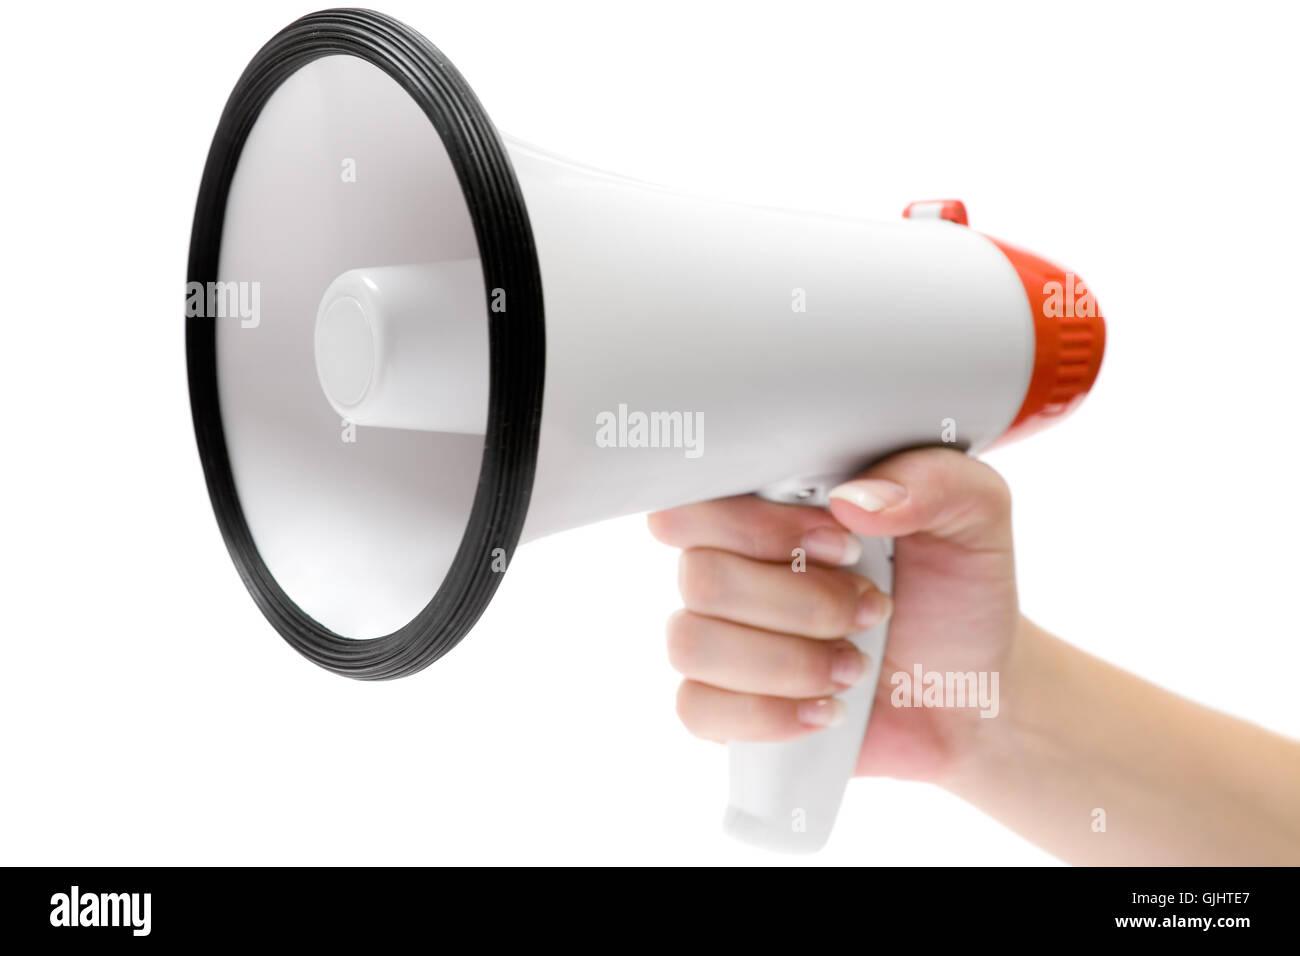 mouthpiece - Stock Image